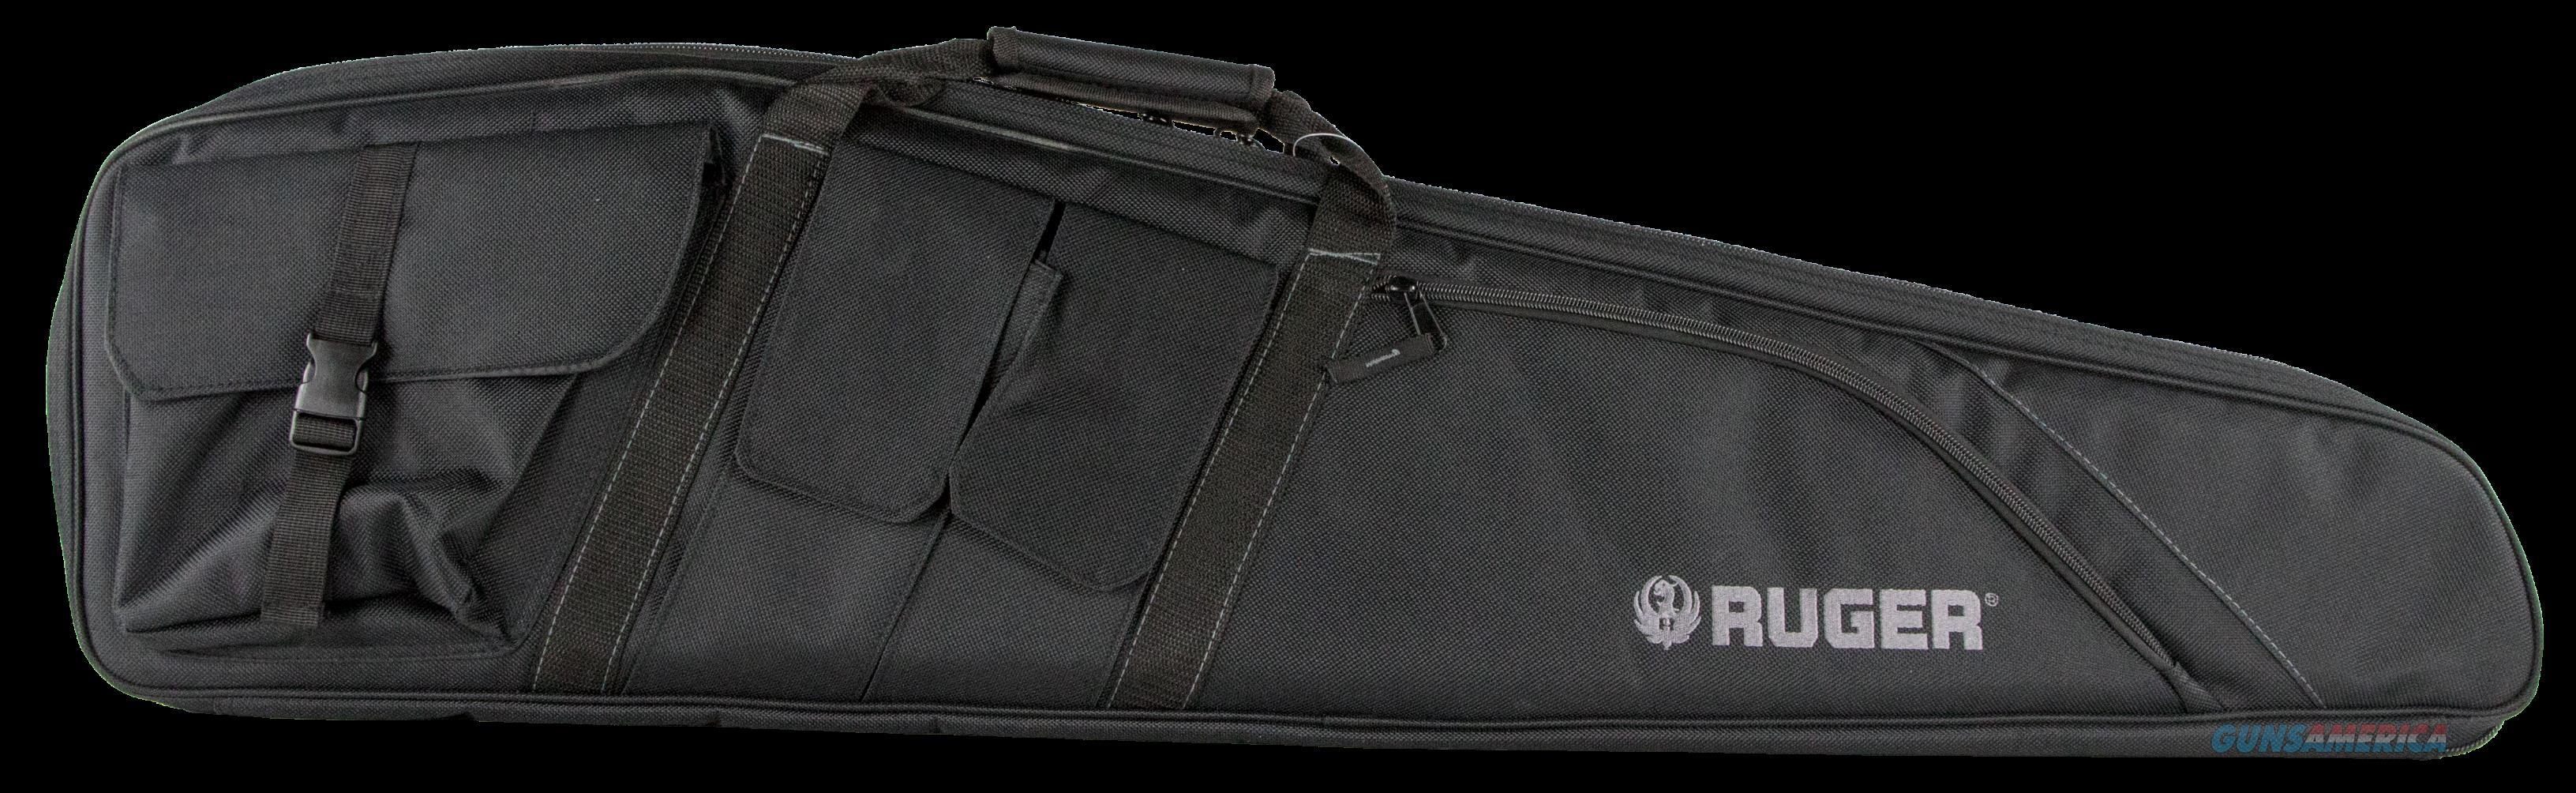 Allen Ruger, Allen 27932 Ruger Defiance Tact Case42  Guns > Pistols > 1911 Pistol Copies (non-Colt)